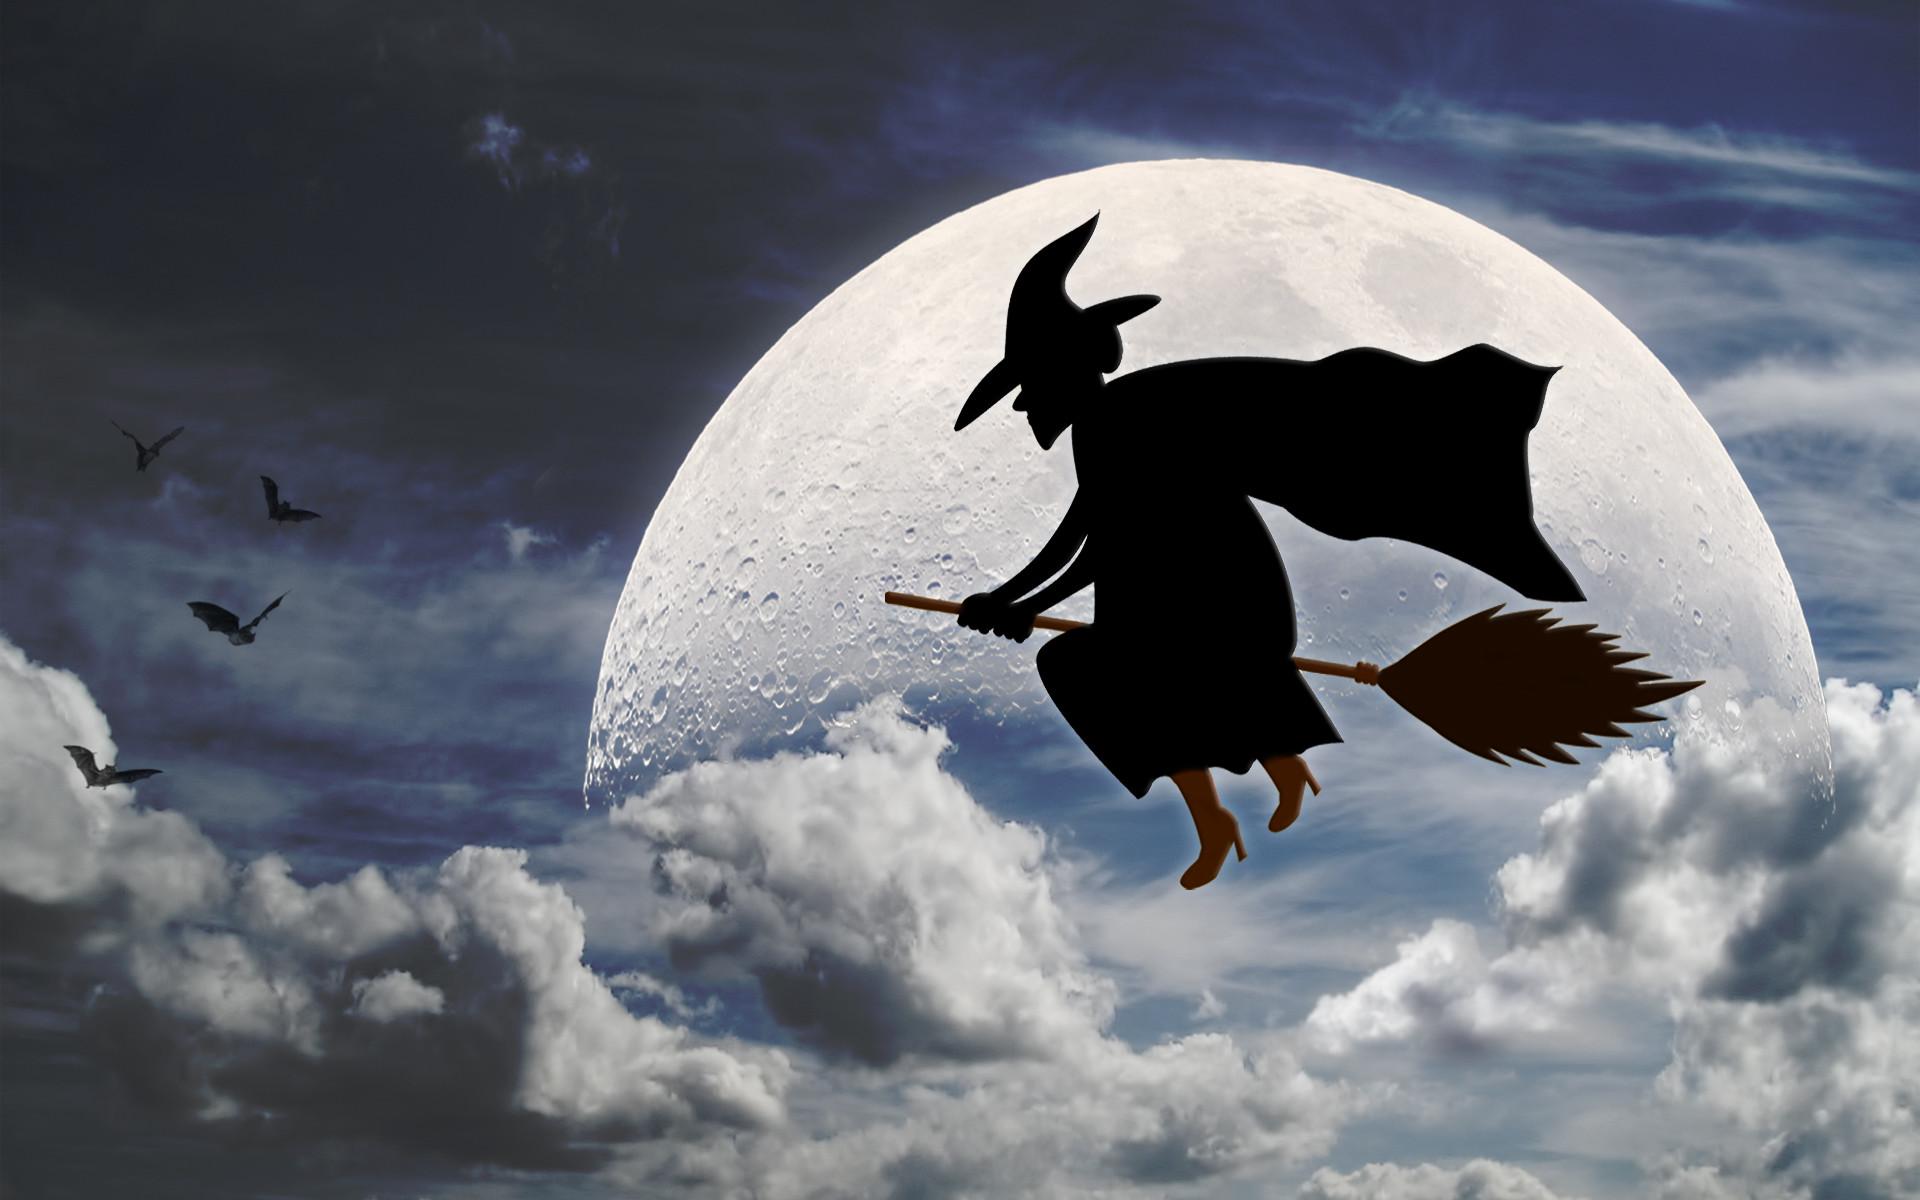 Halloween-Broom-Stick-Witch-HD-Wallpaper